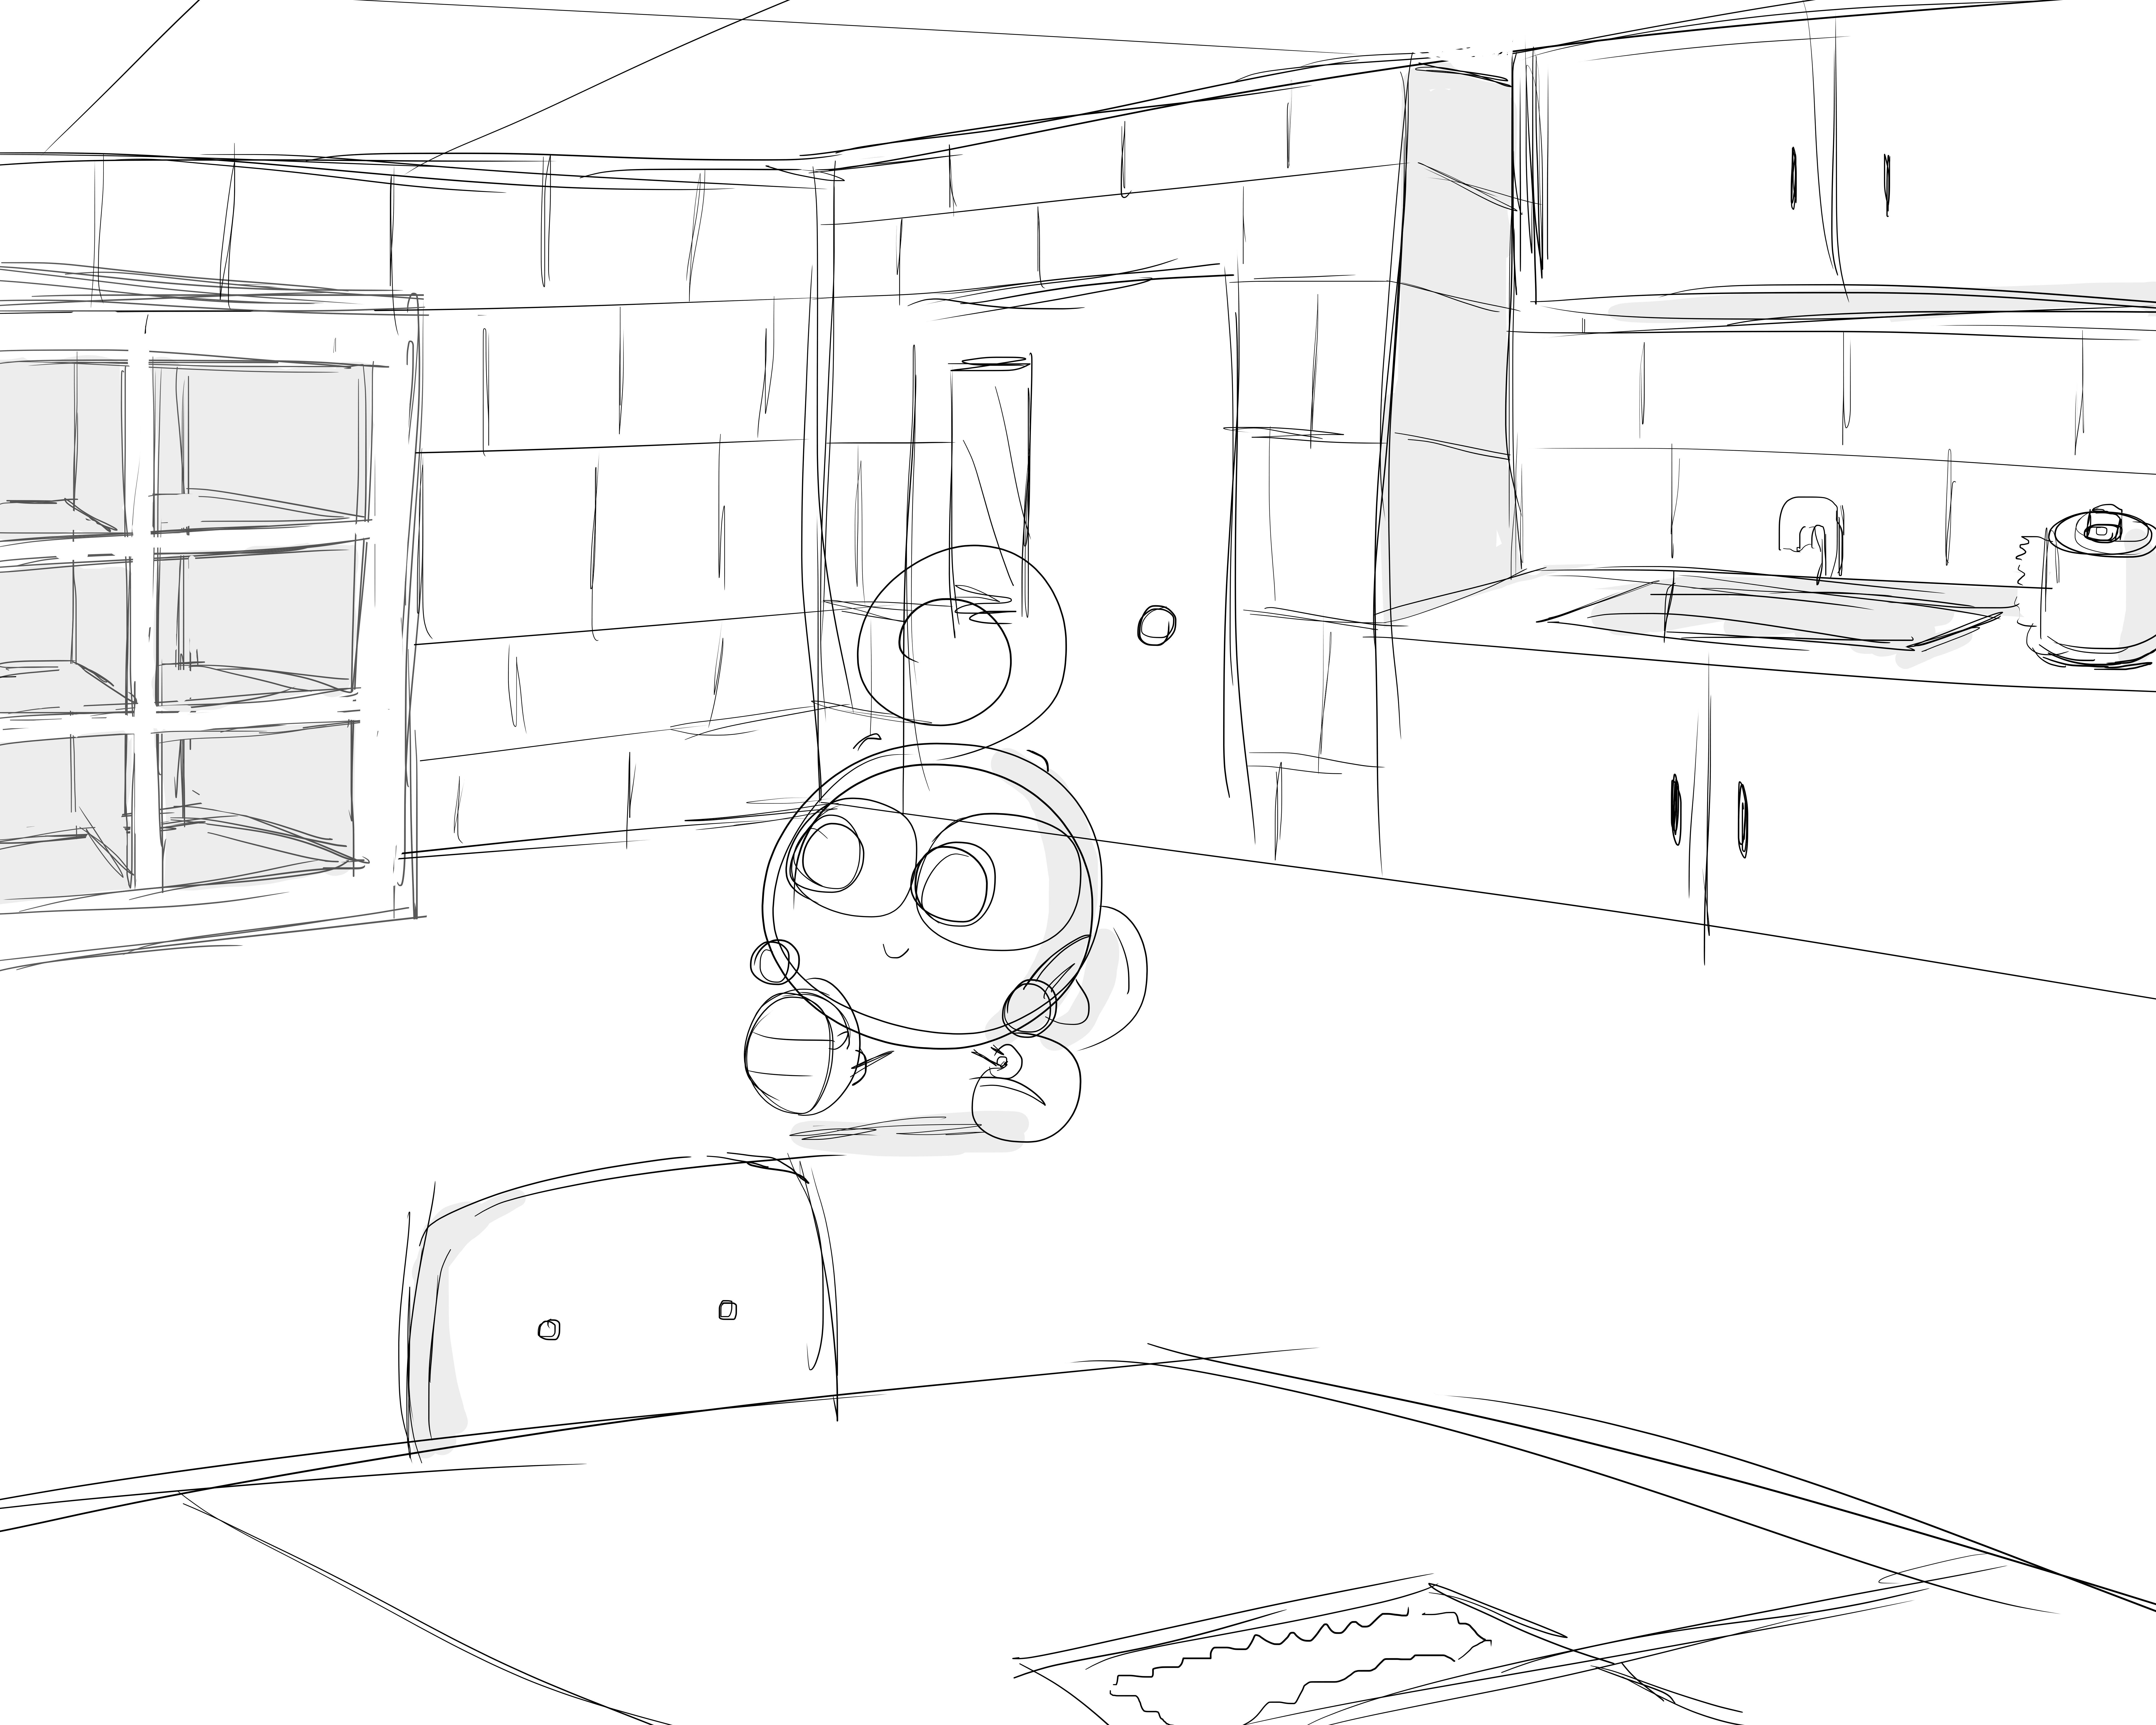 Bobby's Homeroom (sketch)